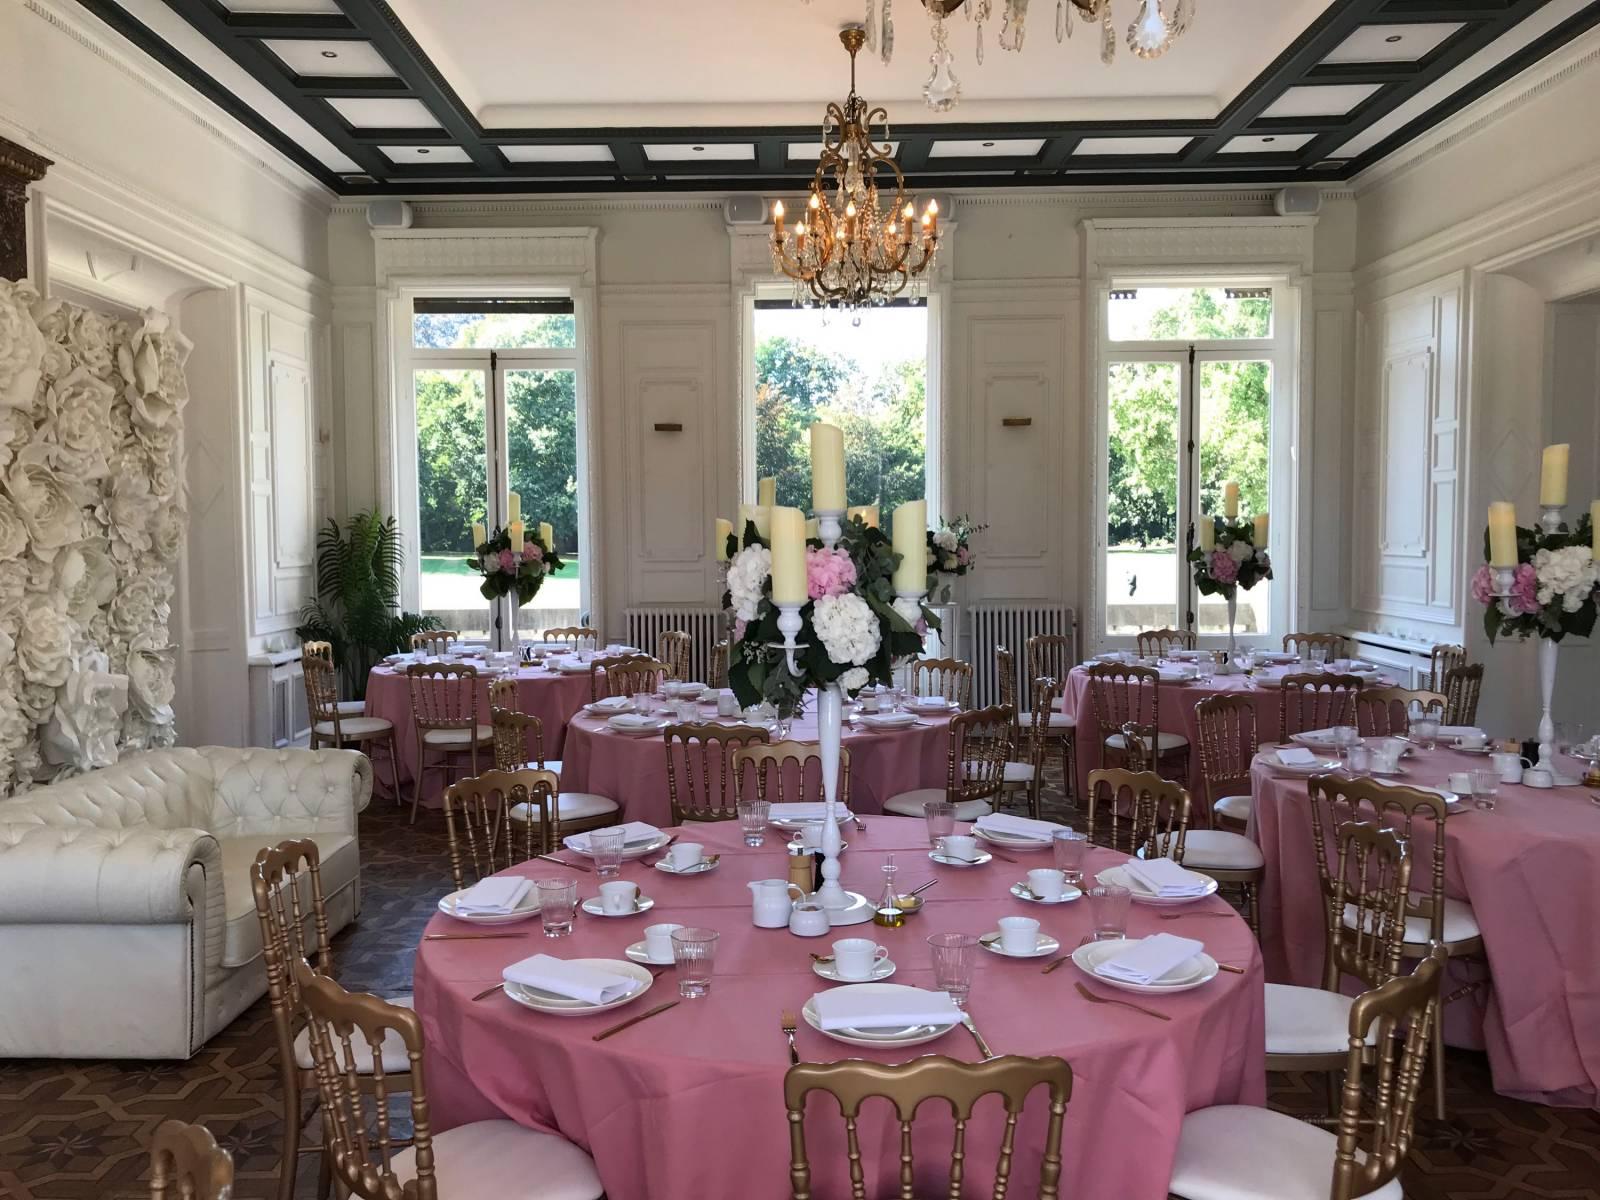 Kasteel Den Brandt - Feestzaal - Trouwzaal - Kasteel - House of Weddings - 3